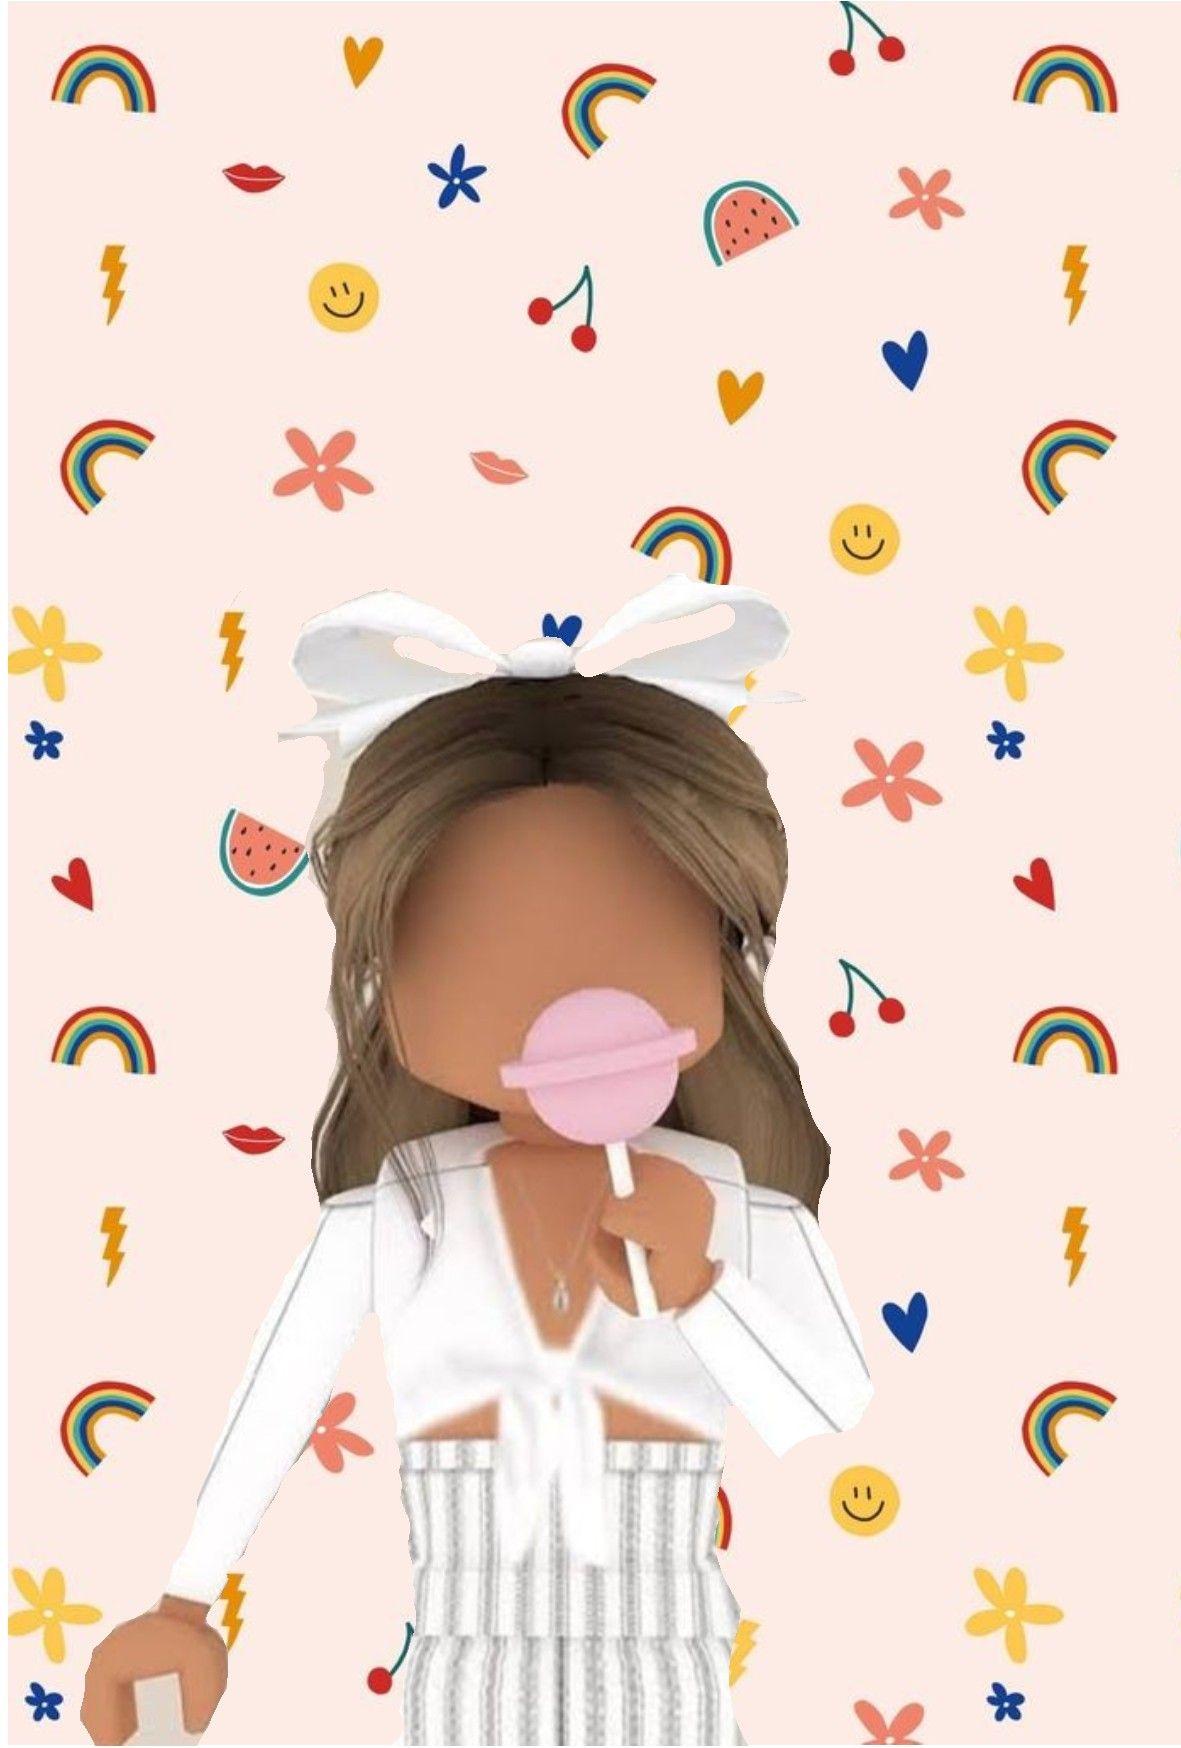 Roblox Animado Avatares De Roblox Chicas Cool Chica Roblox In 2020 Cute Tumblr Wallpaper Roblox Animation Roblox